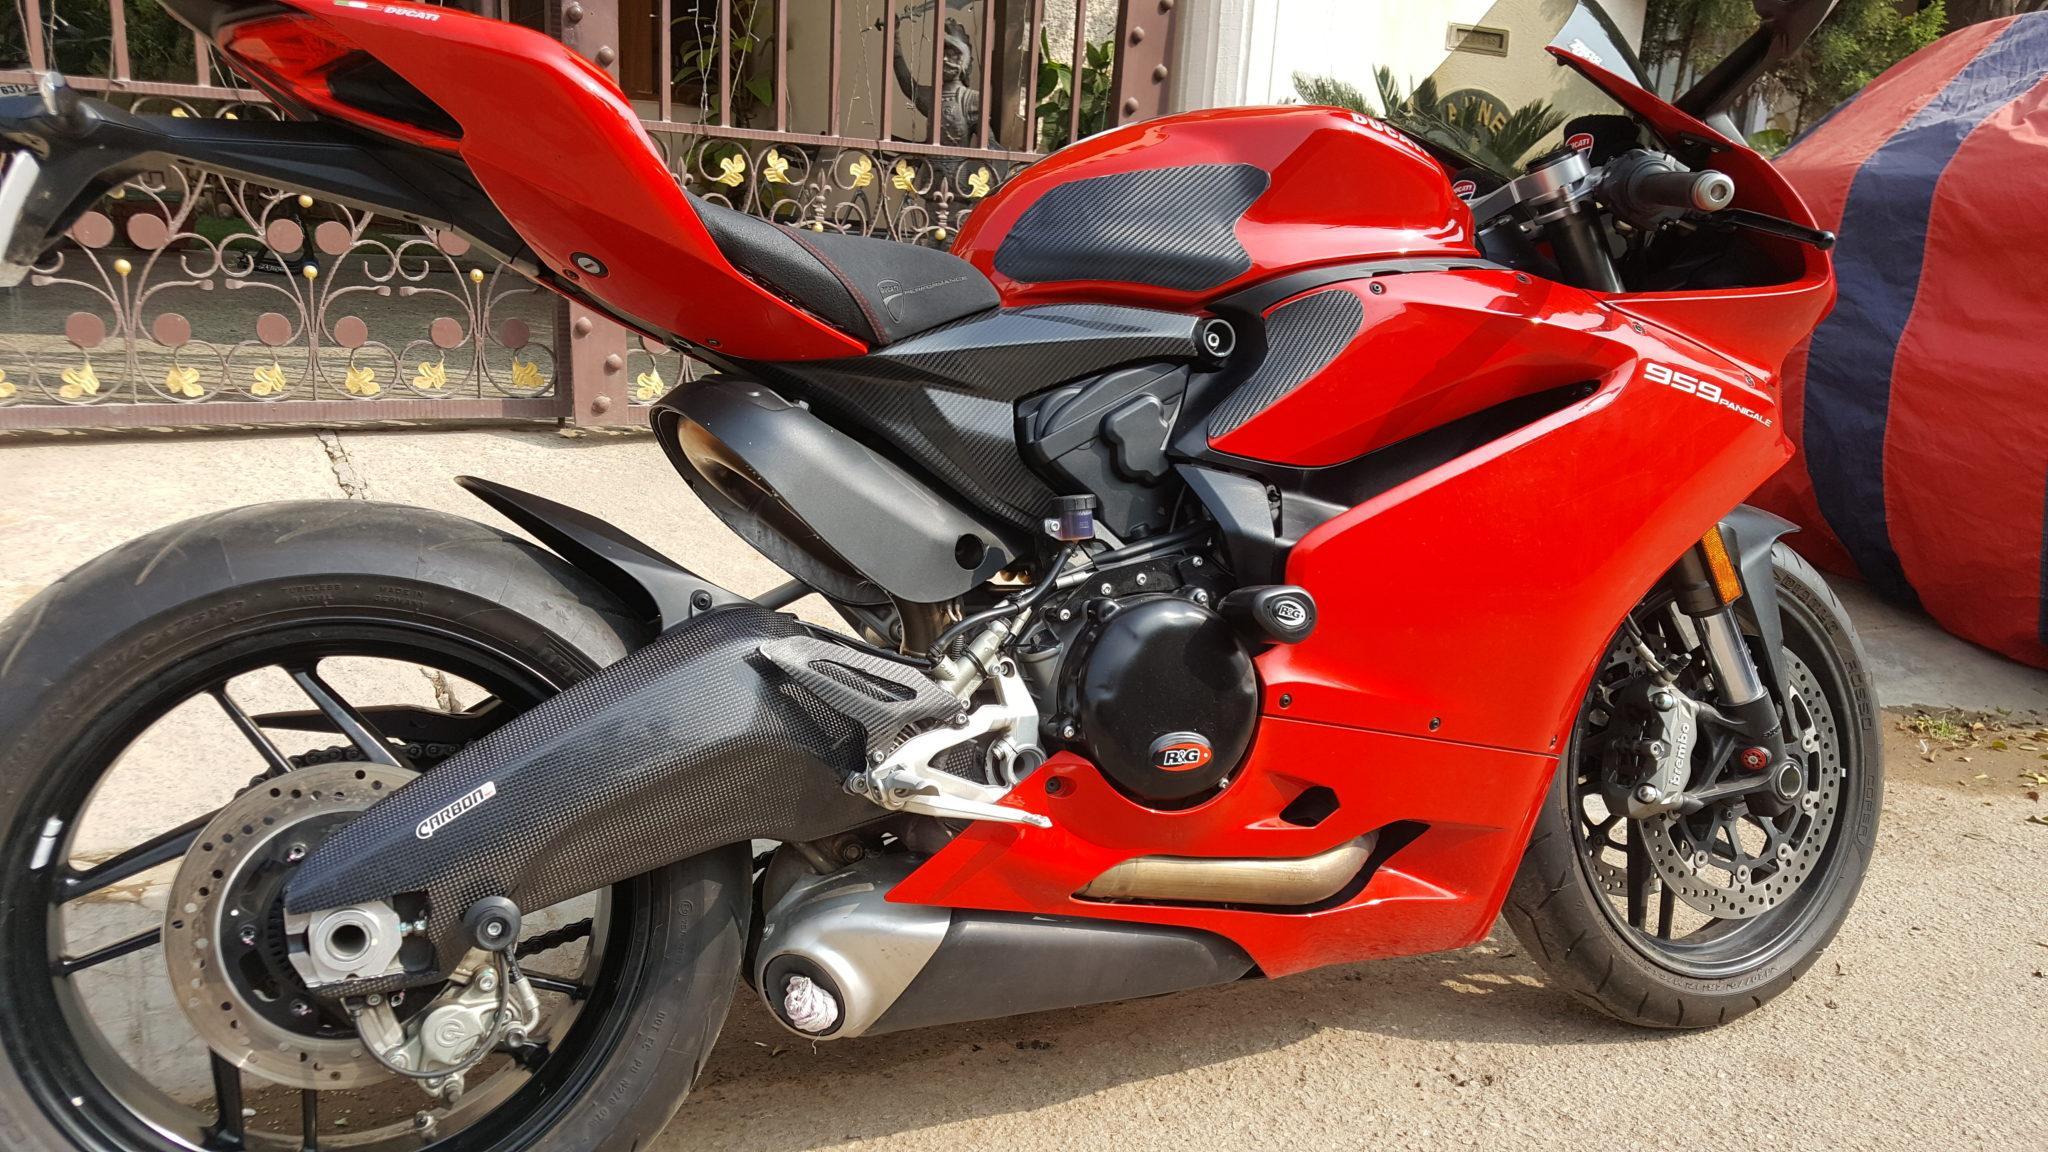 Ducati Panigale 899 959 Carbon Fiber Swingarm Covers